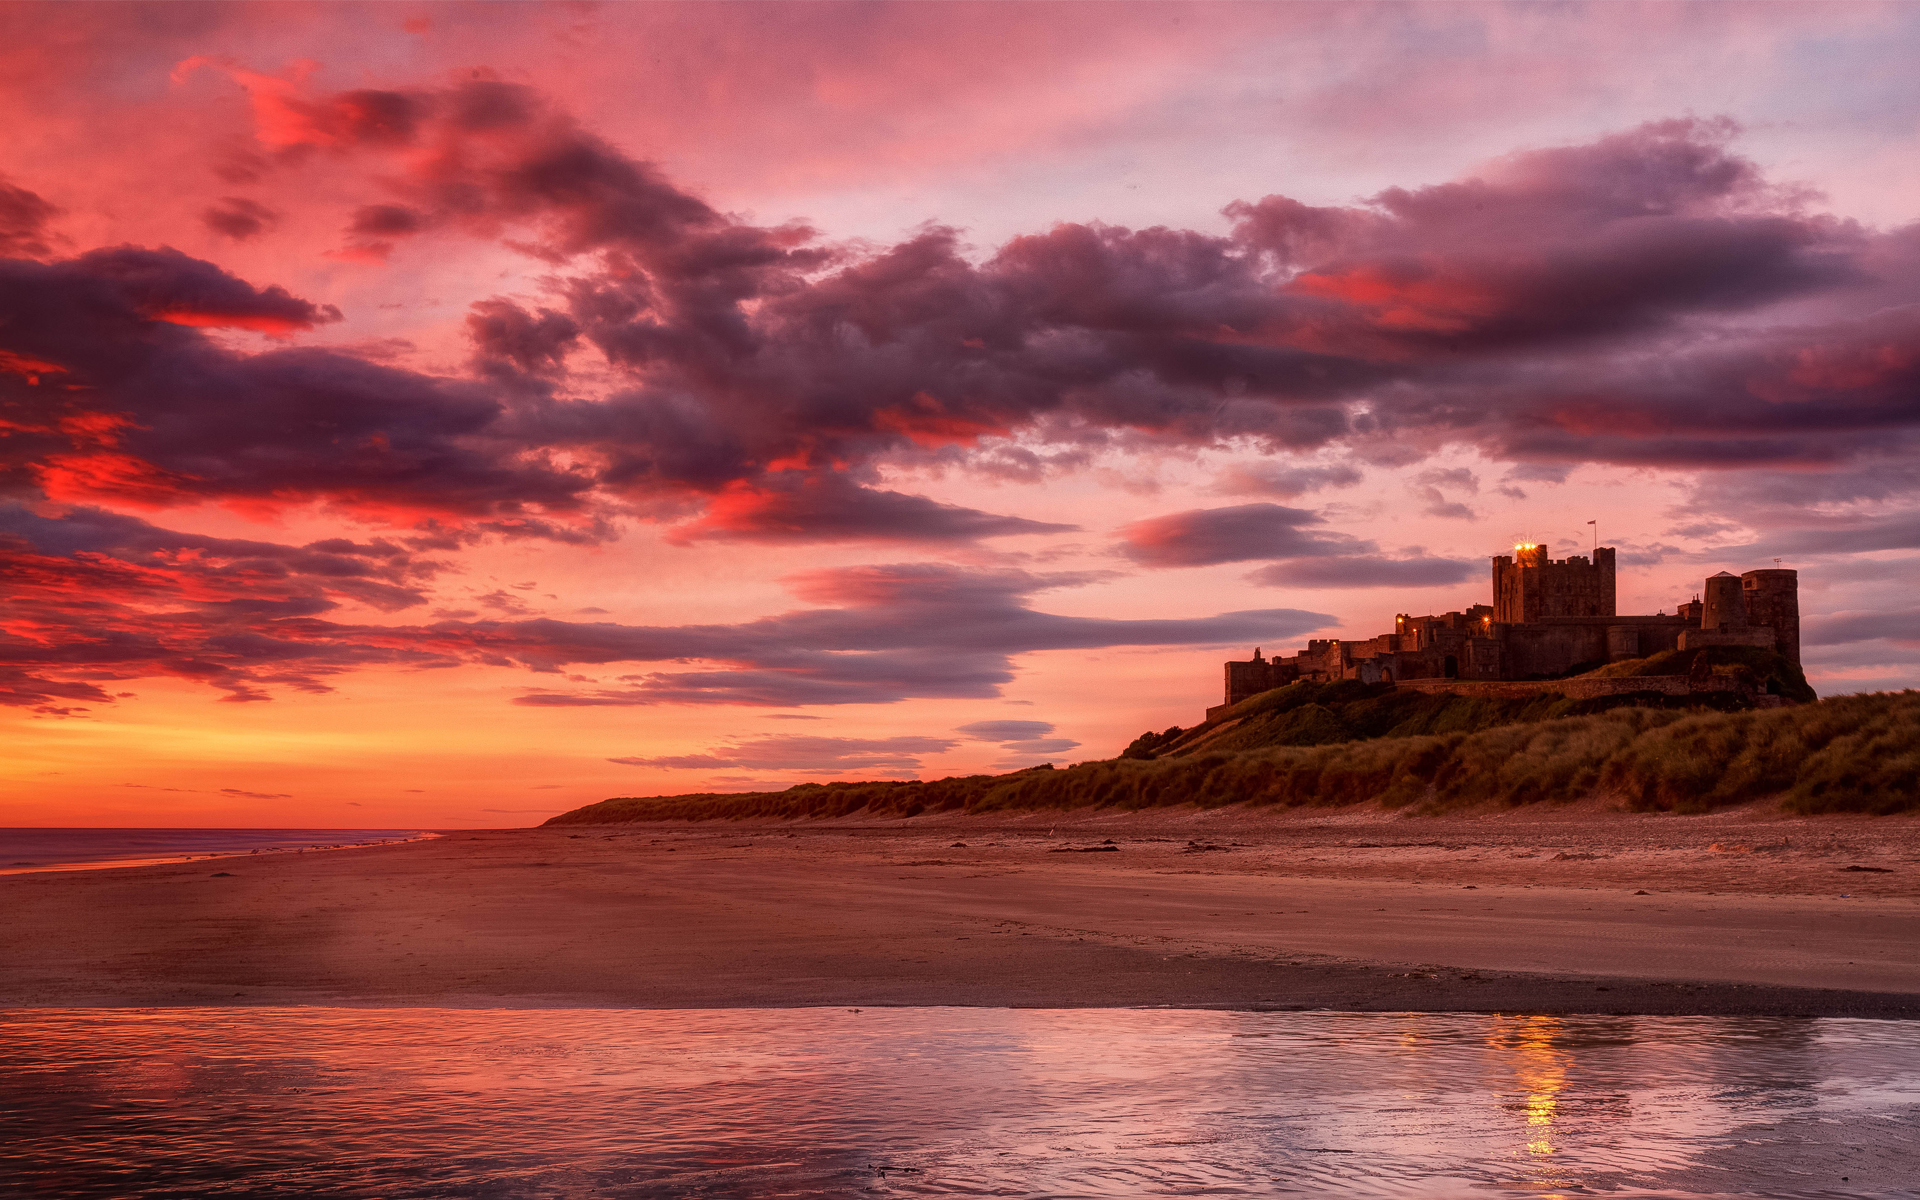 Sun Beach And Sea Wallpaper: Sand Castle Wallpaper